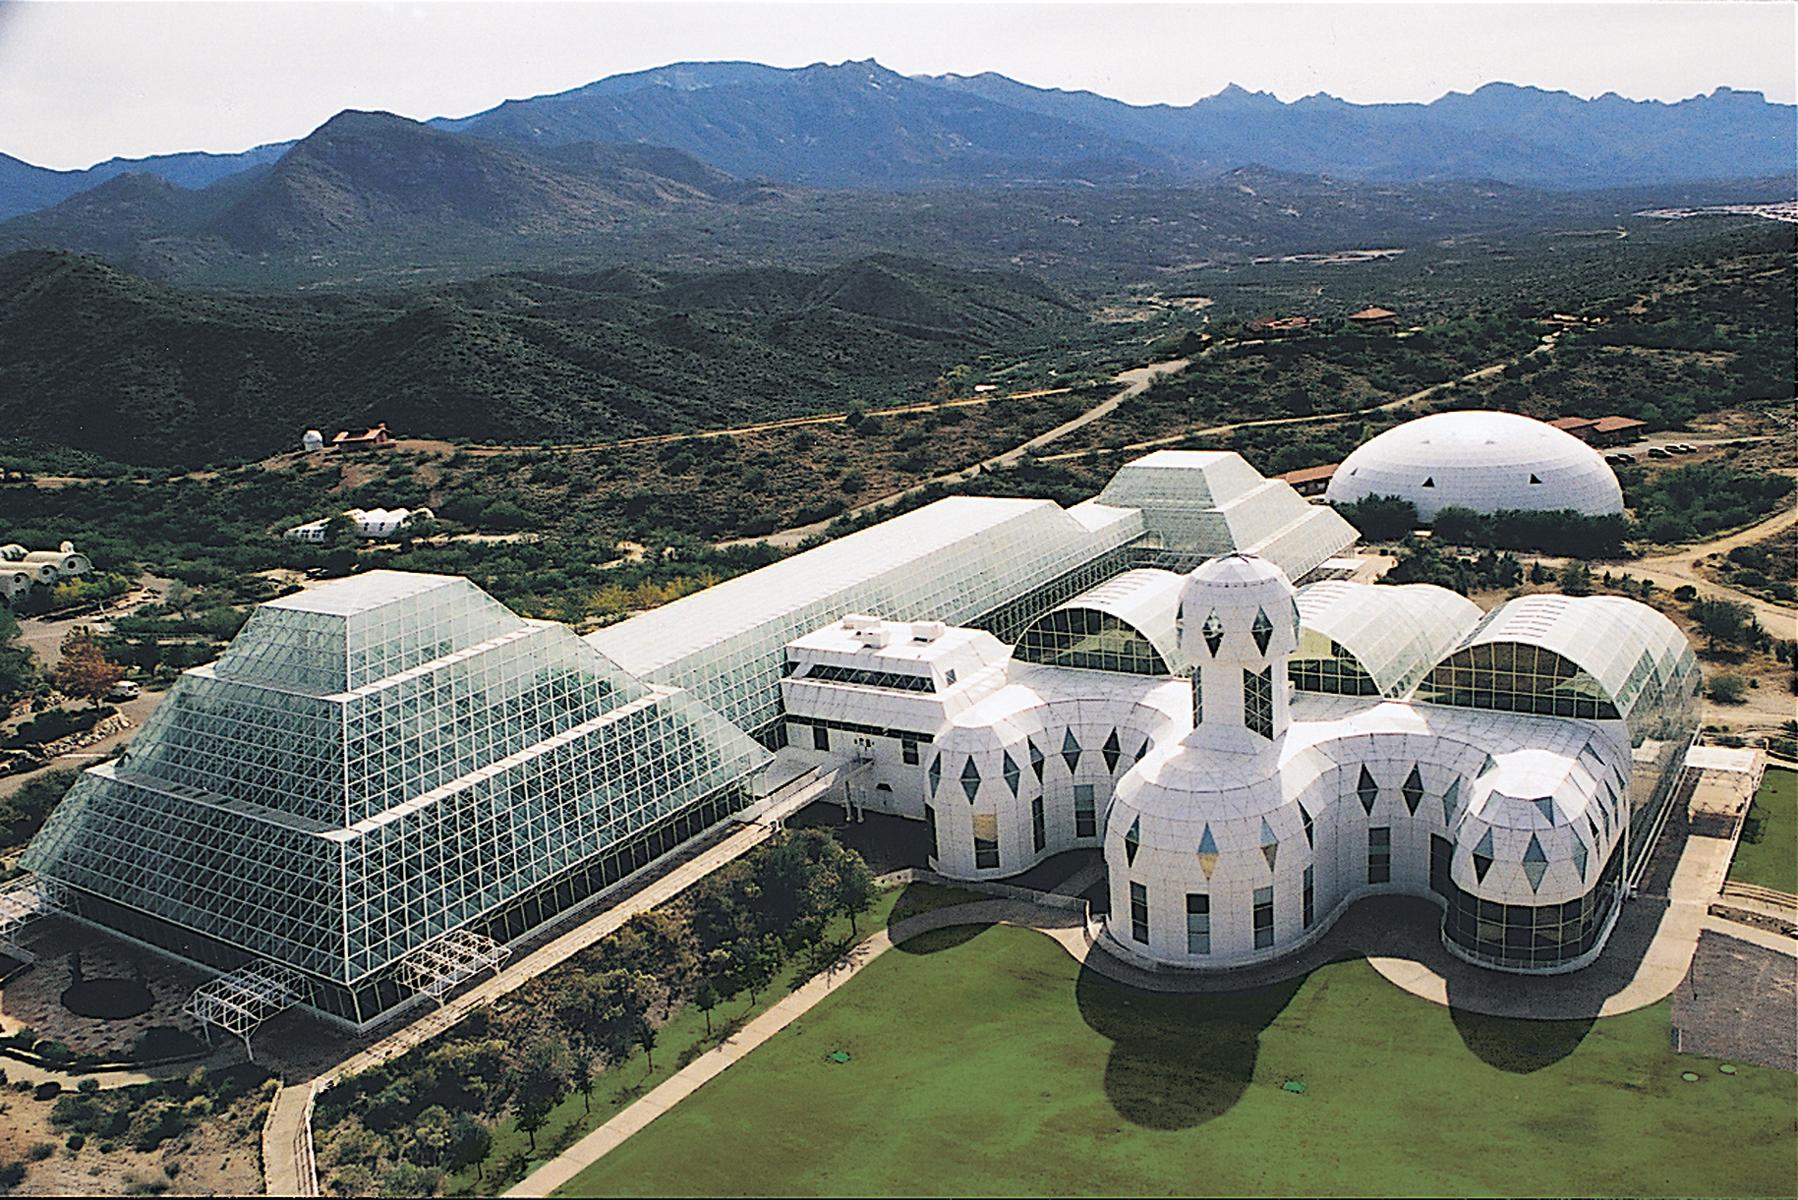 079-02 Biosphere 2 Complex